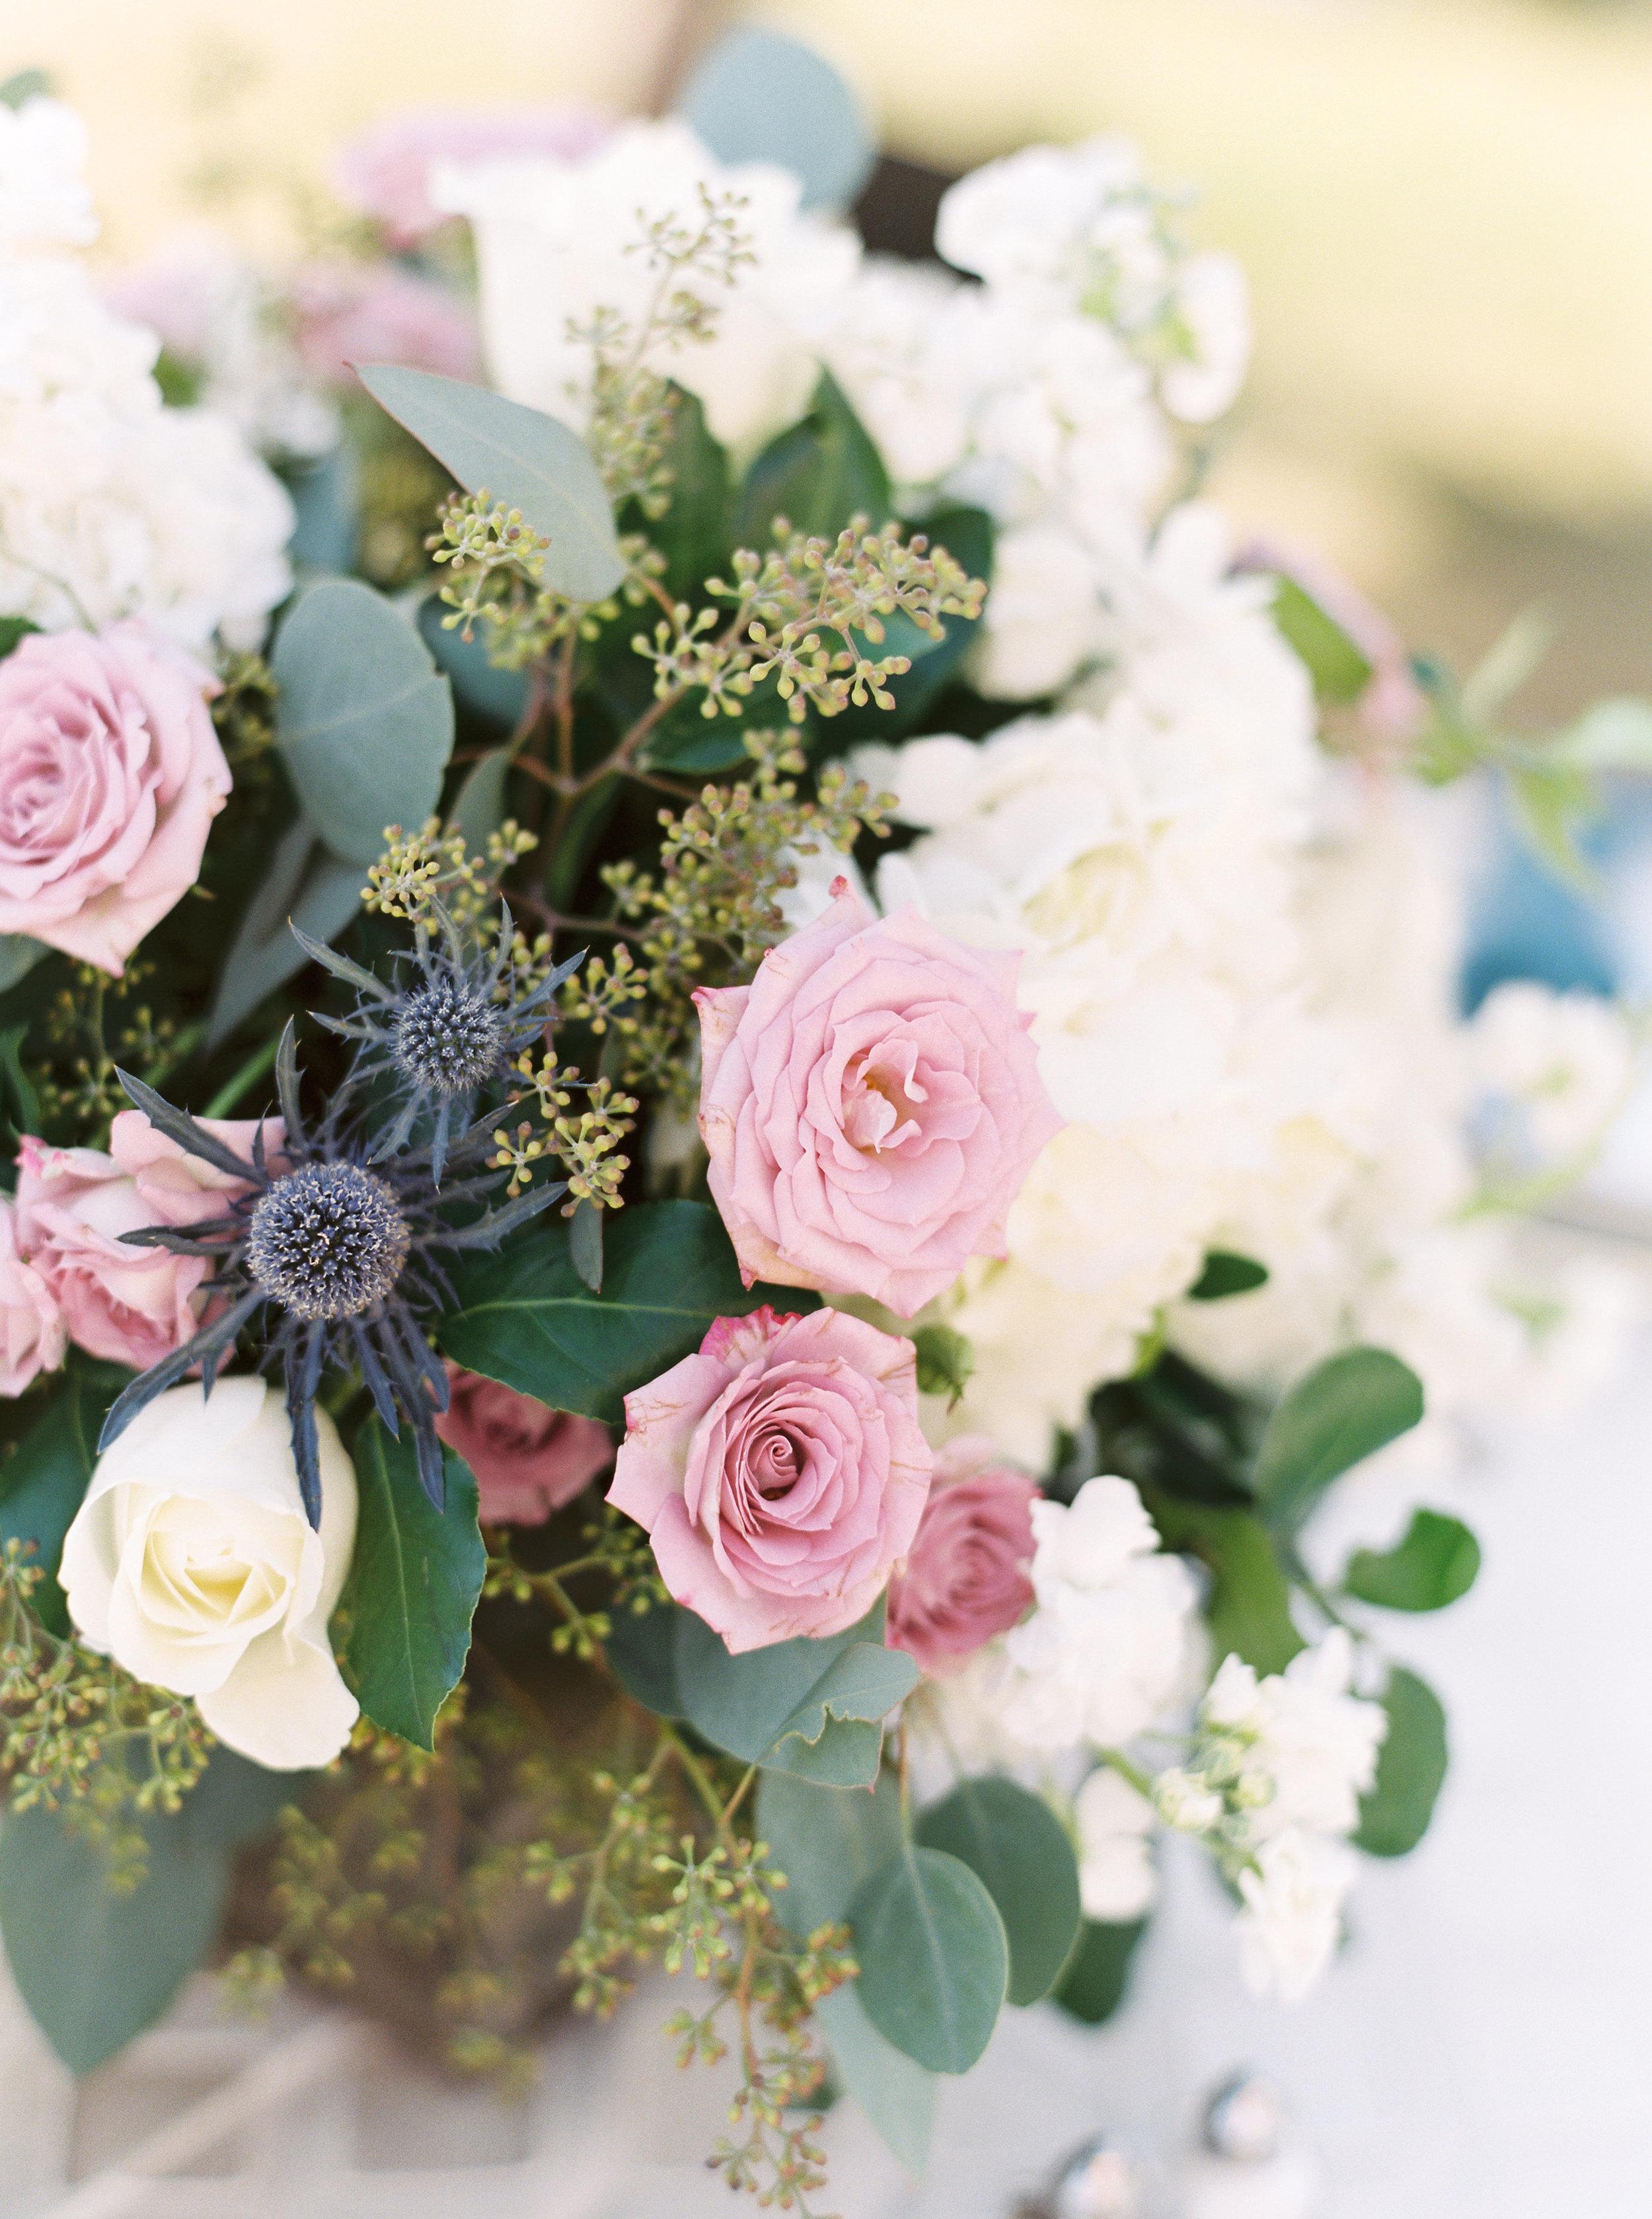 the-purple-orchid-resort-wedding-in-livermore-california-110.jpg